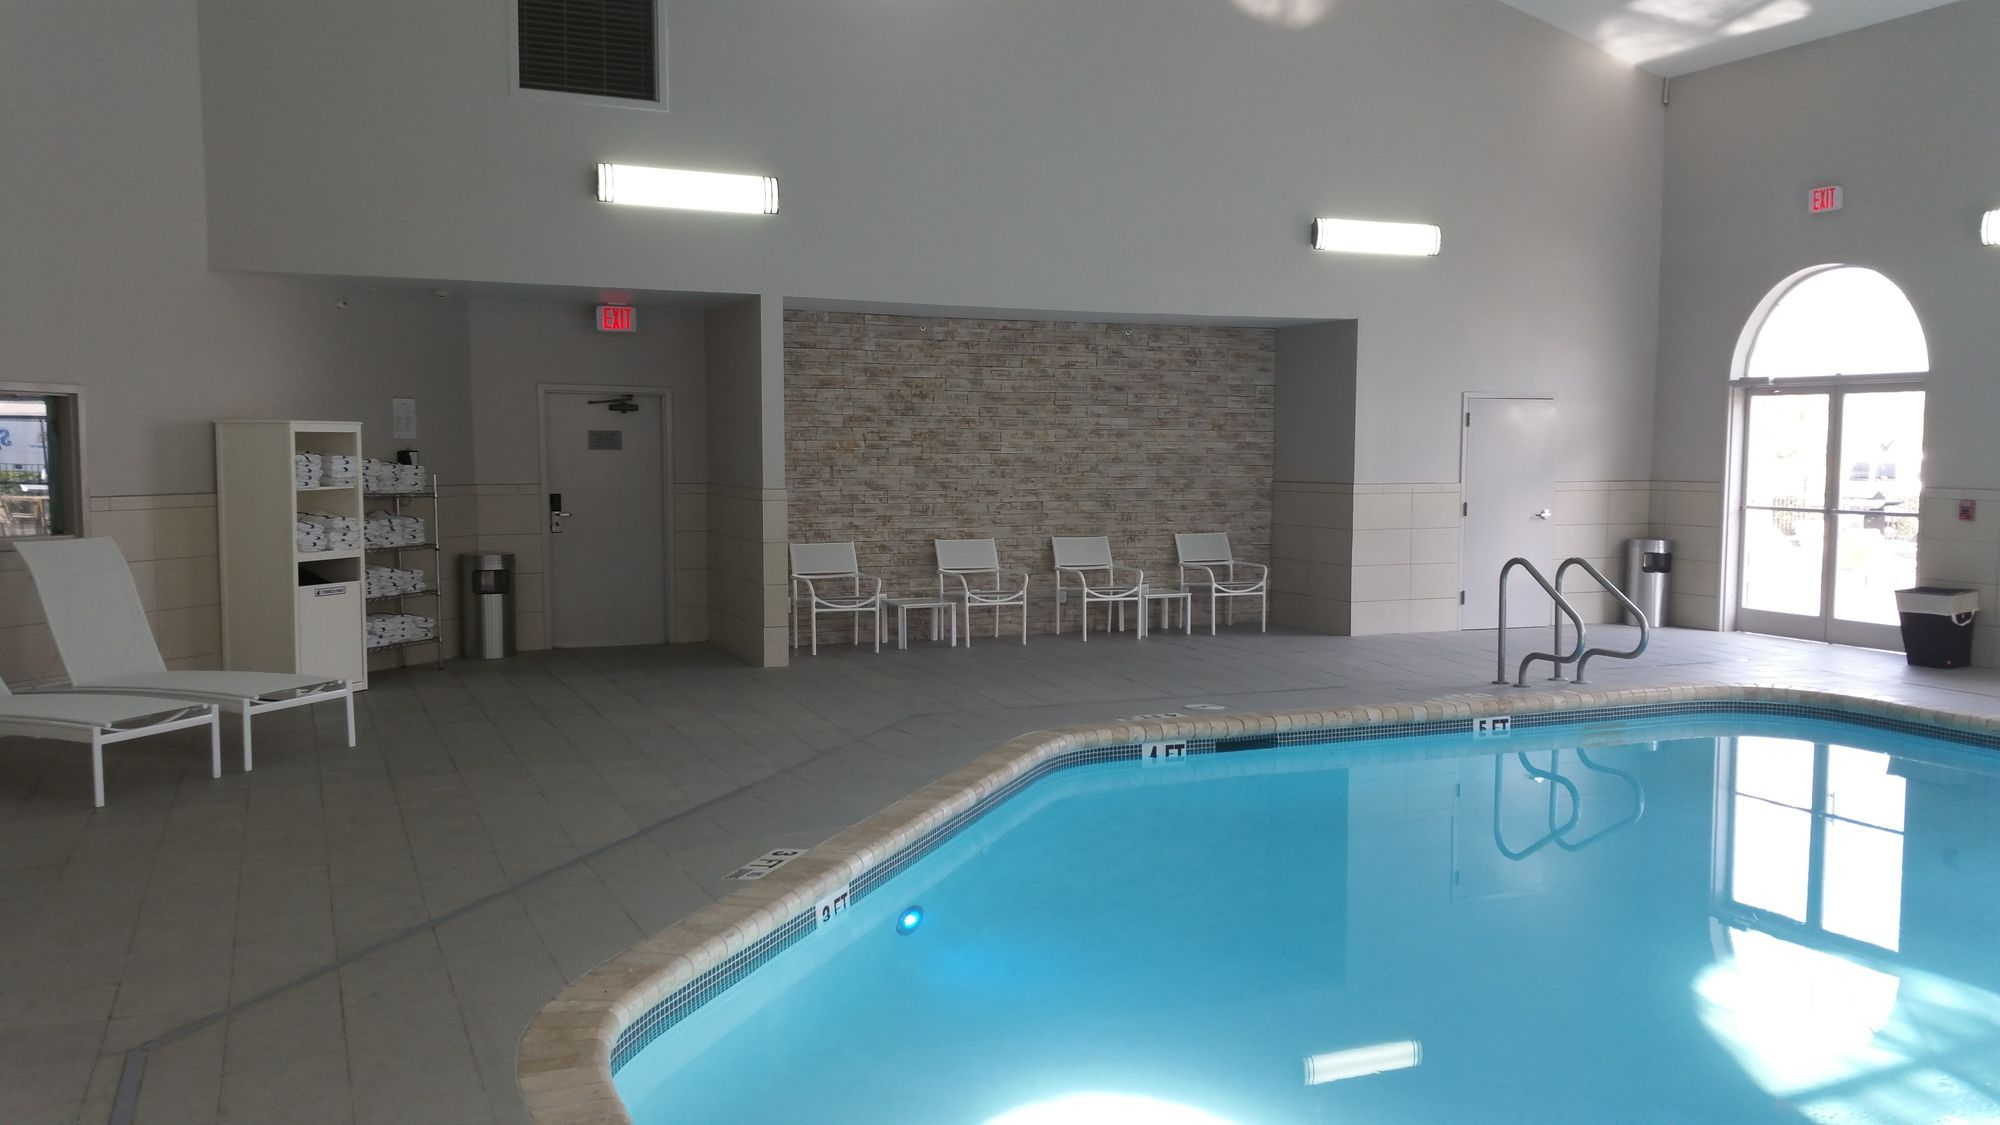 LaQuinta Inn & Suites- Chattanooga Hamilton Place